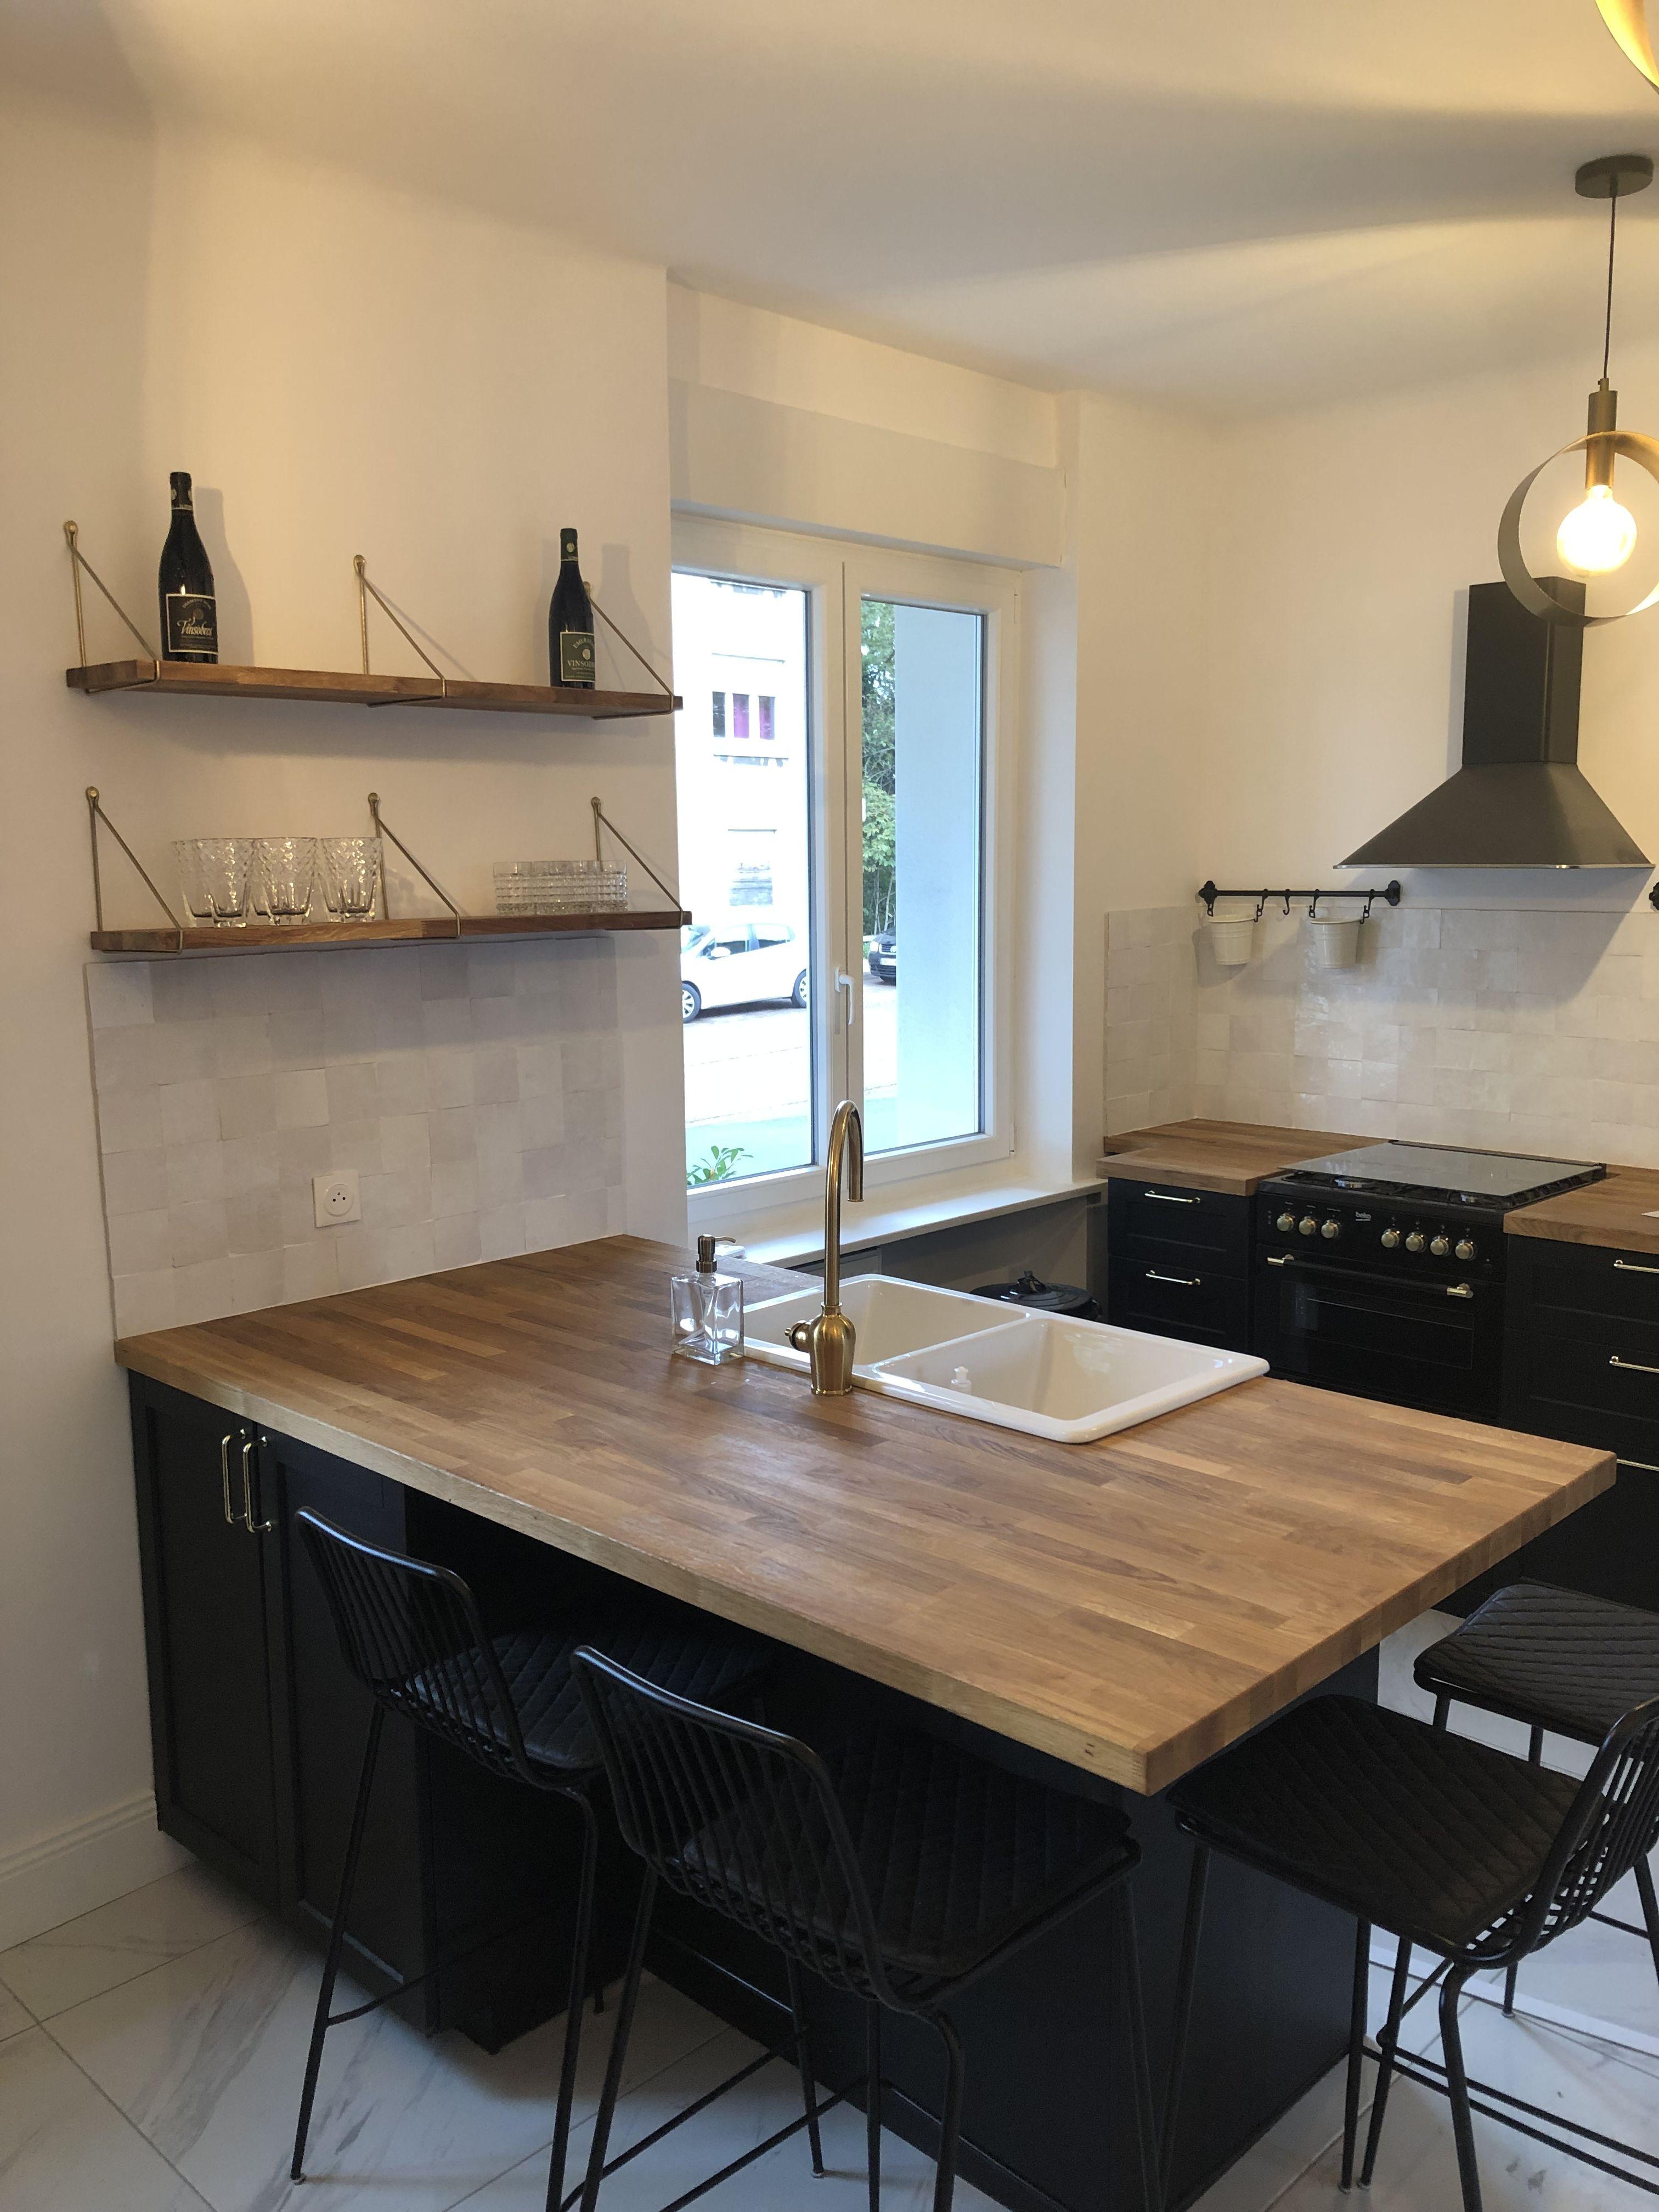 Pin By Adrienn Klein On Kitchen In 2020 Kitchen Home Decor Ikea